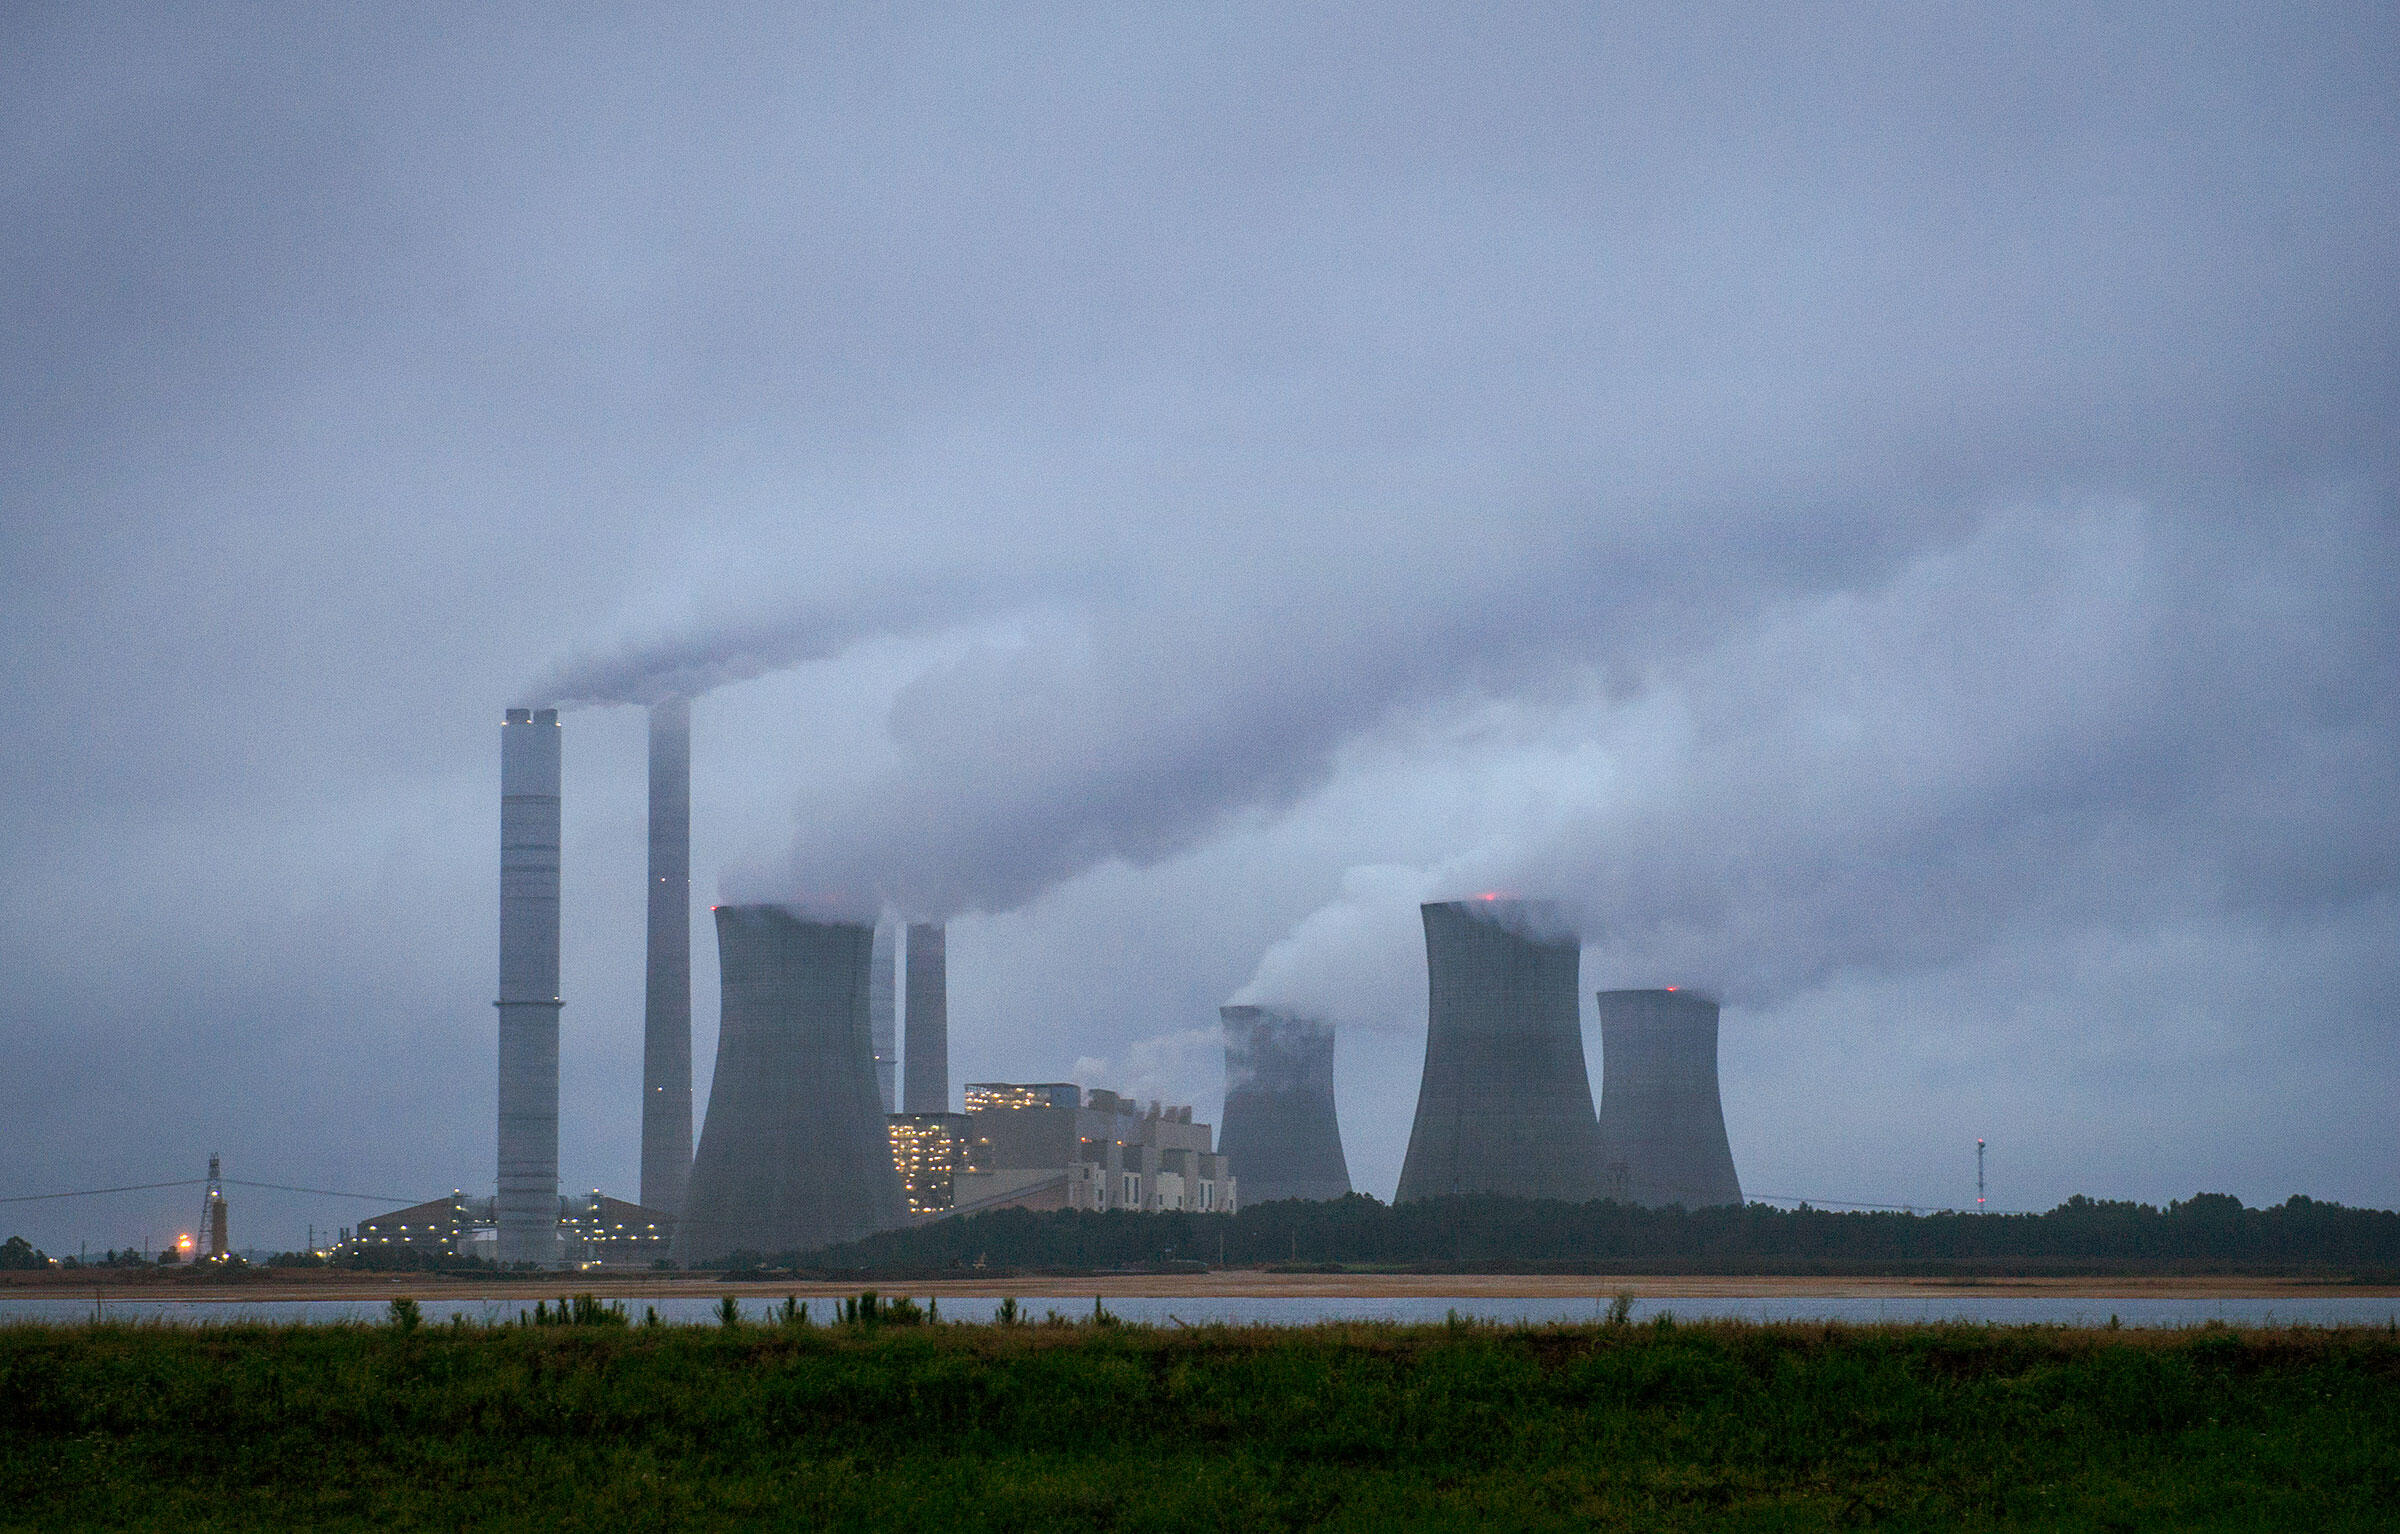 Robert W. Scherer Power Plant in Juliette, Georgia, one of the largest coal-fired power plants in the U.S. John Amis/AP